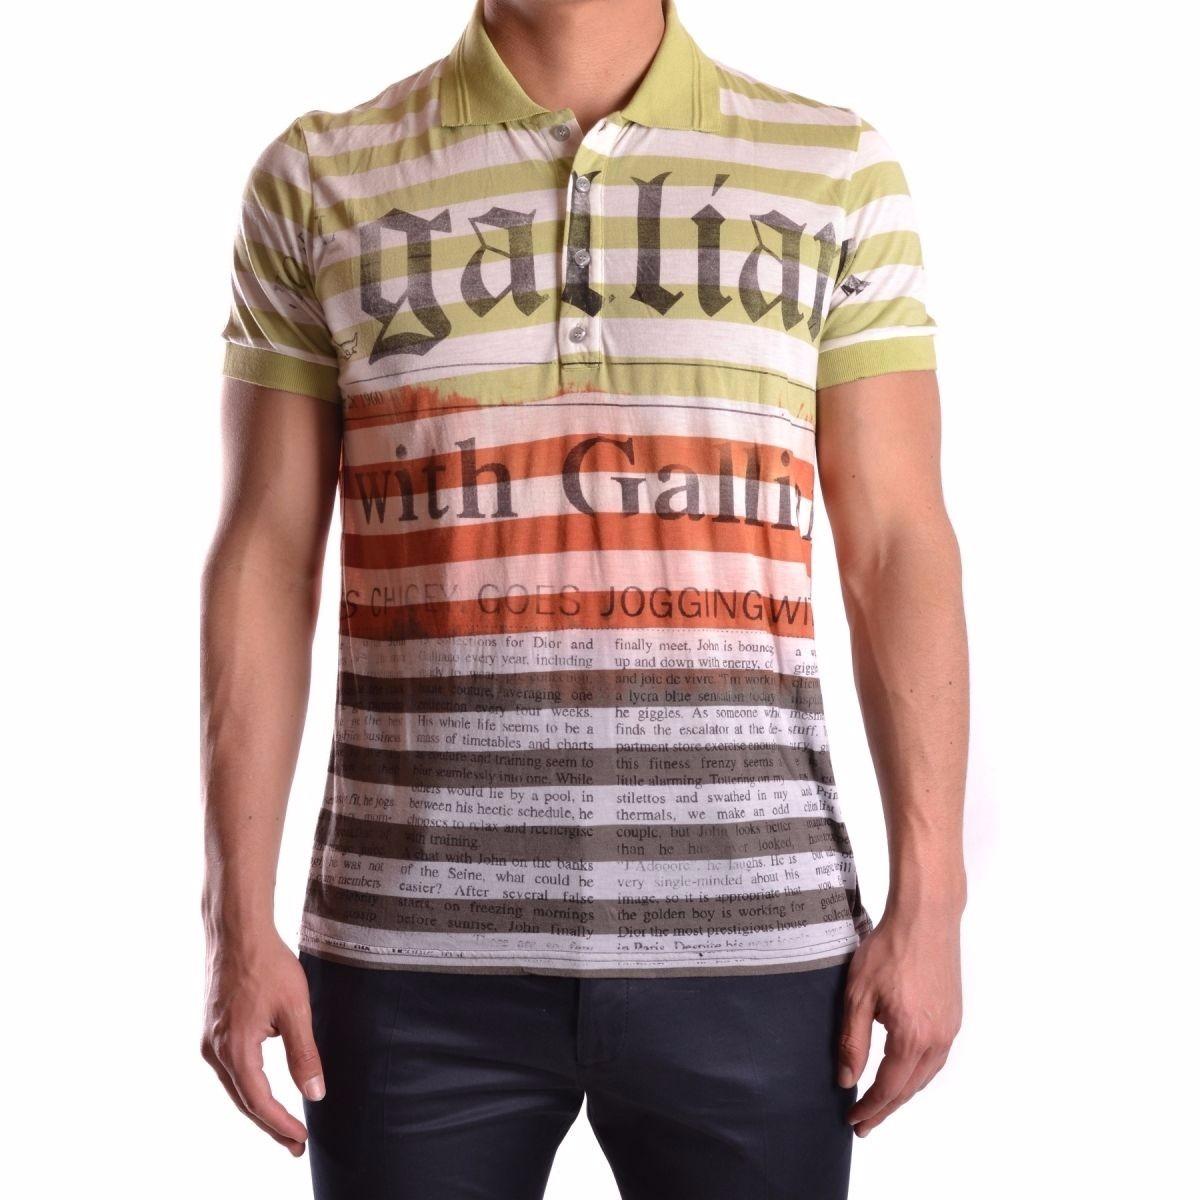 Camisa Polo John Galliano Made In Greece Exclusiva Única - R  429 7ce652d1025c2